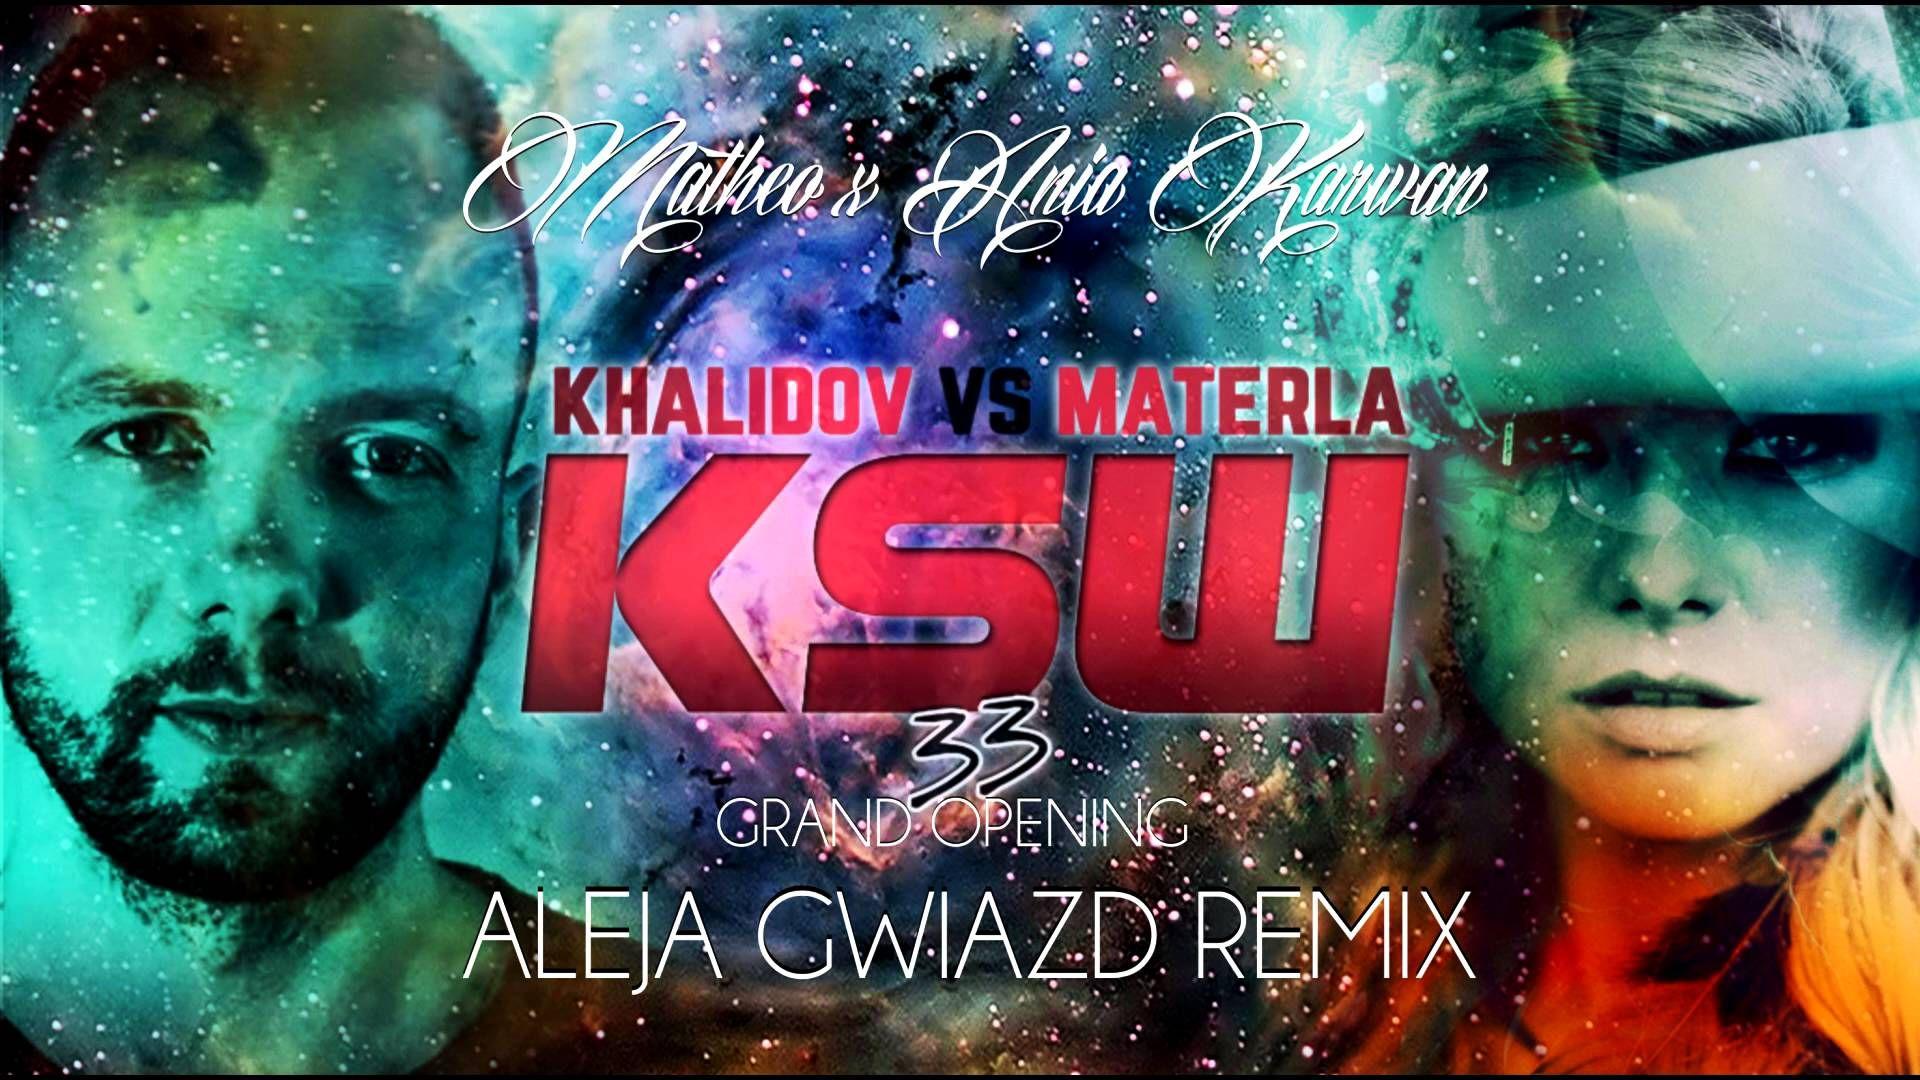 Matheo X Ania Karwan Aleja Gwiazd Remix Ksw 33 Grand Opening Remix Grands